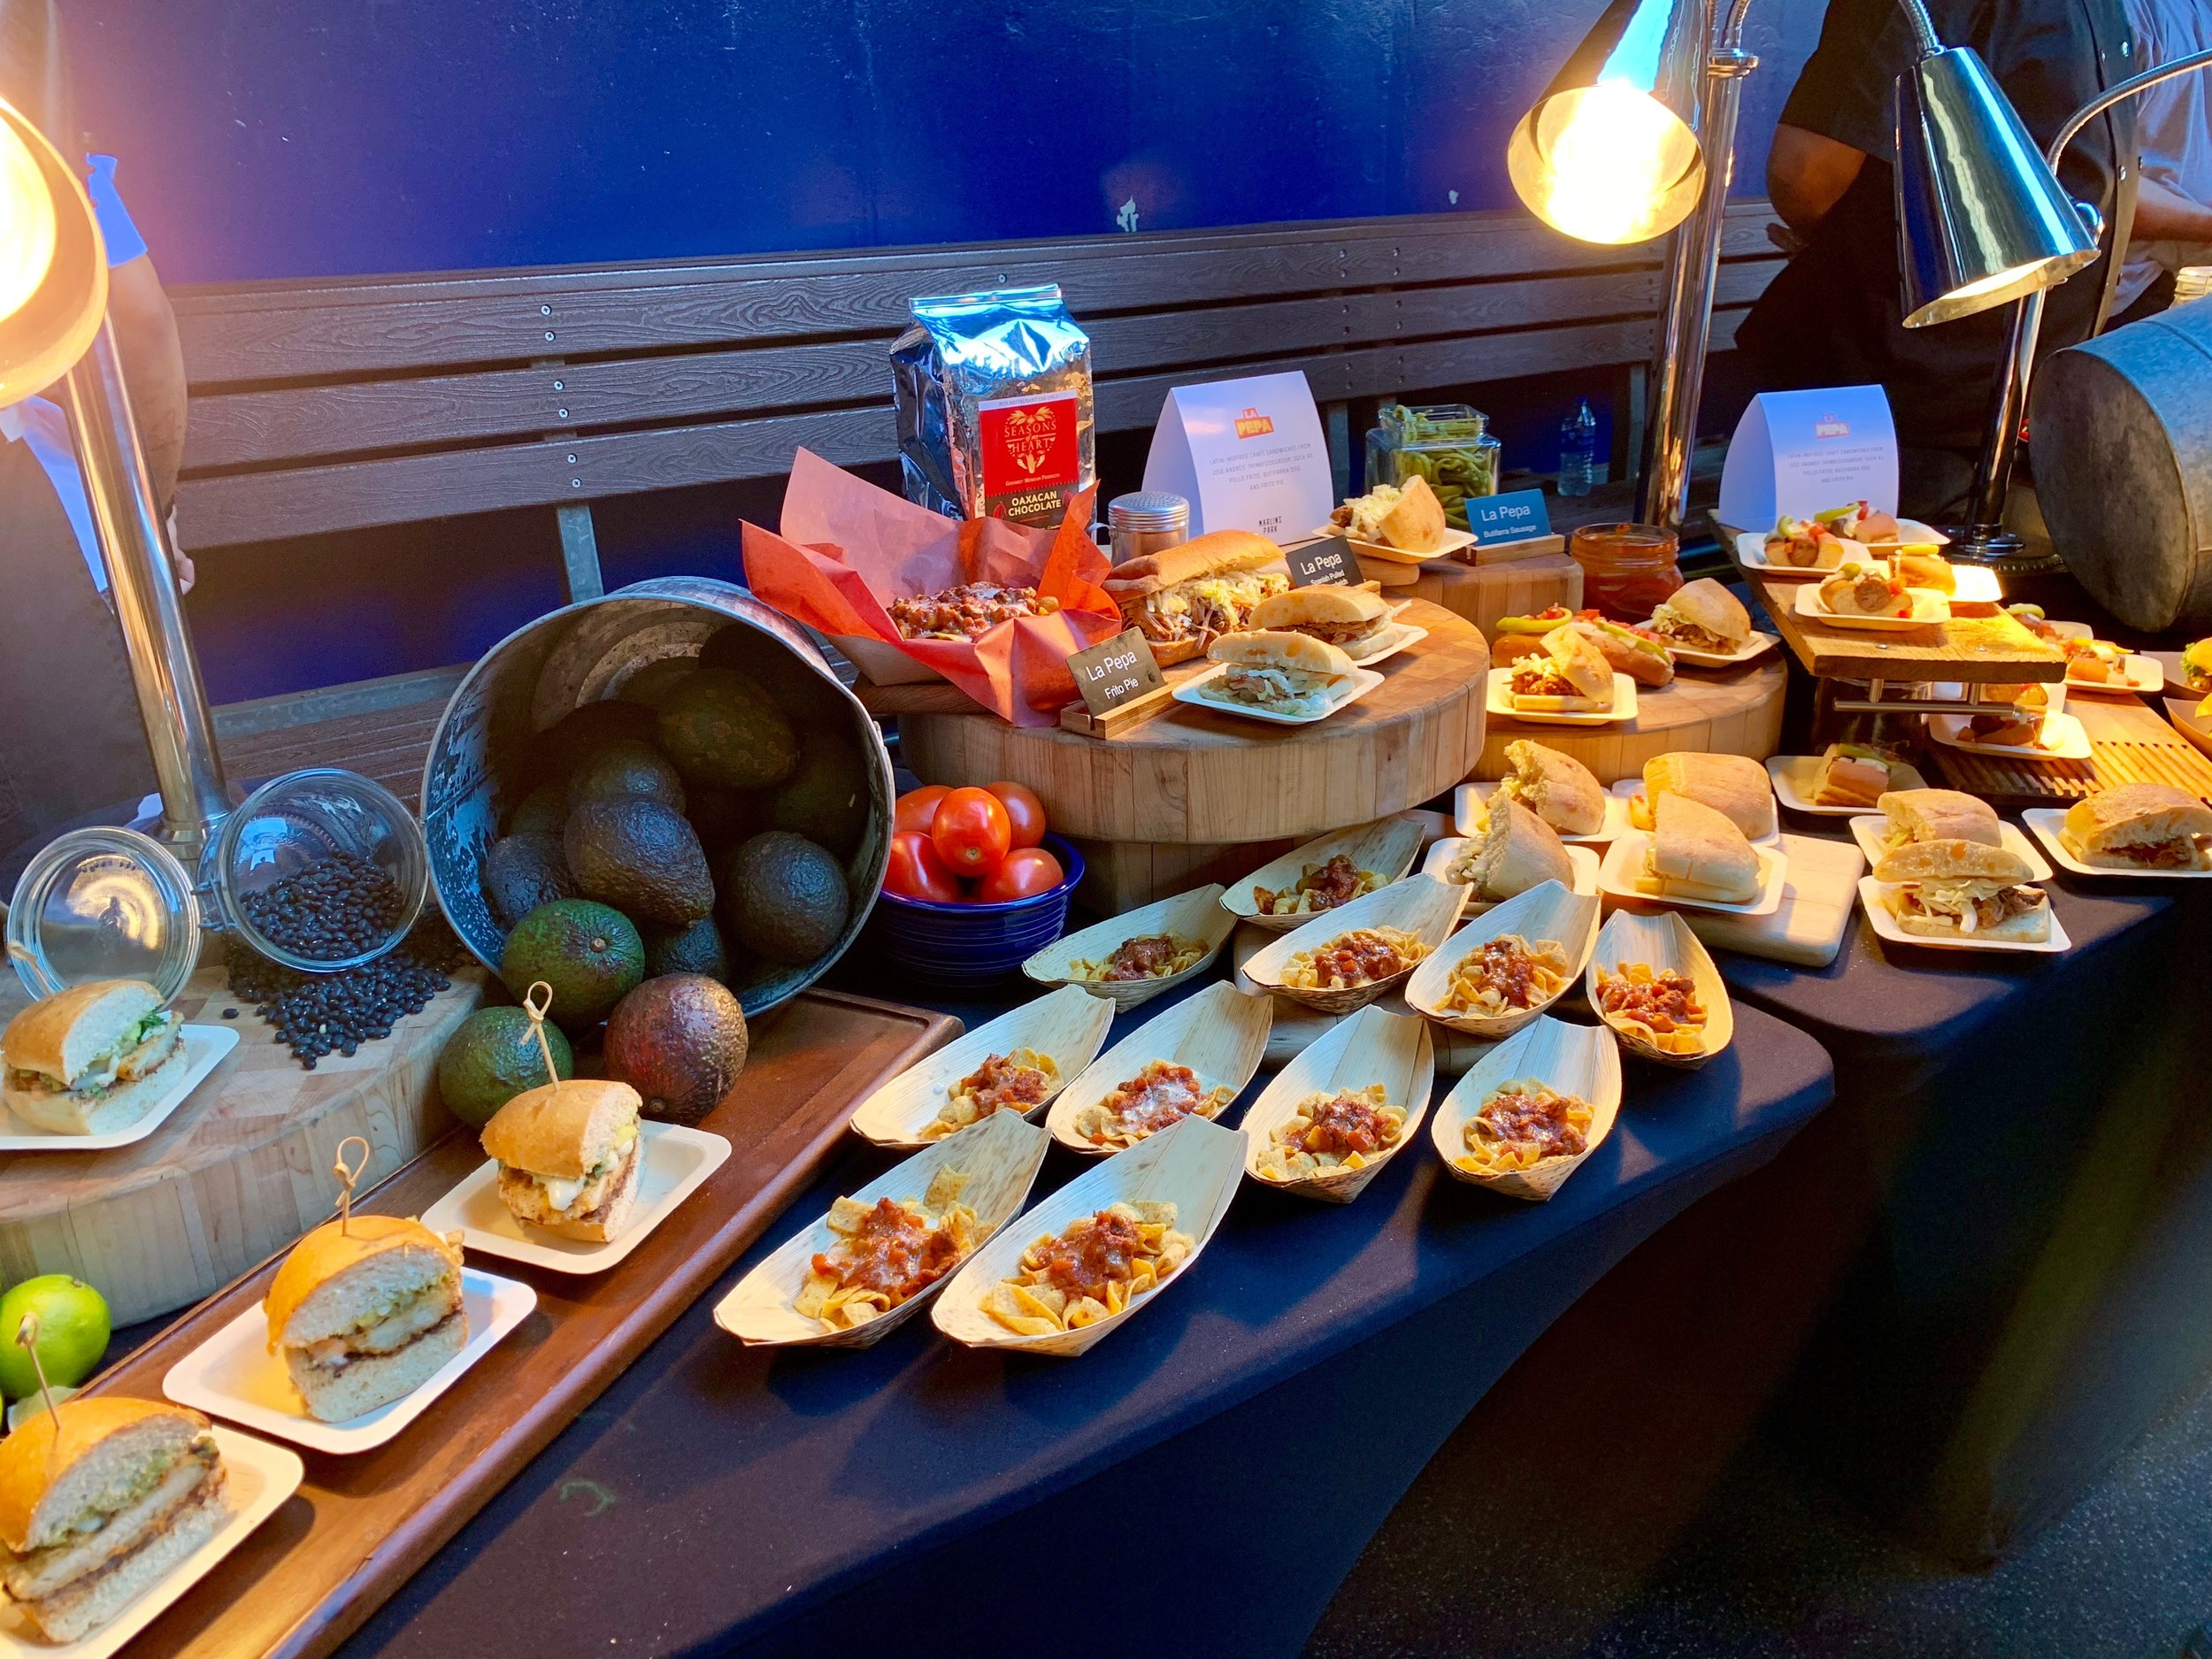 Marlins Park New Food_12.JPG